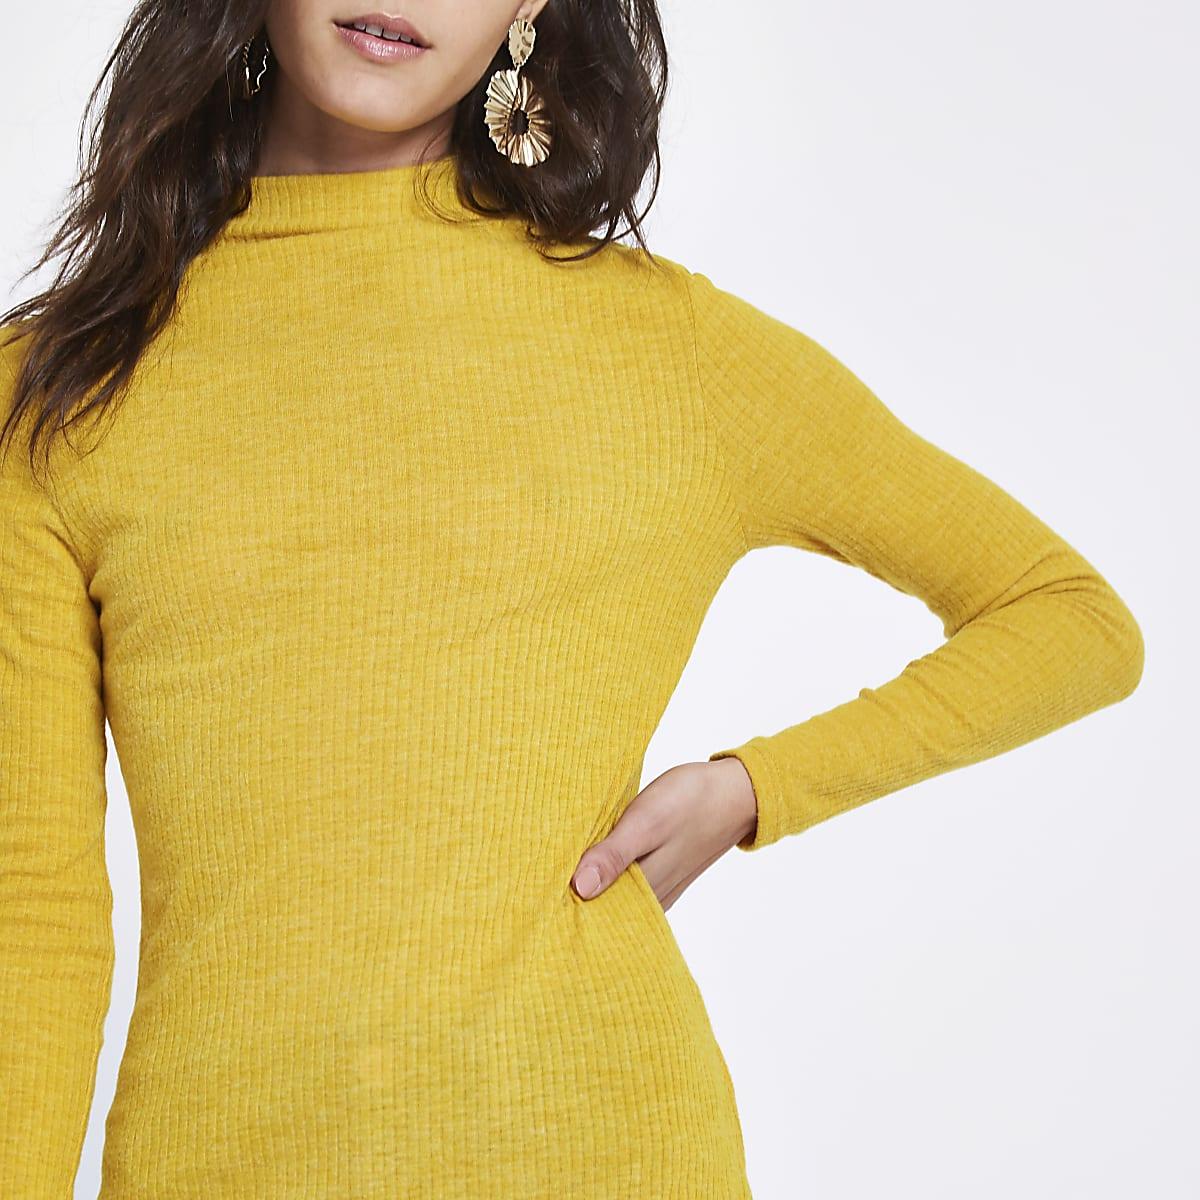 Yellow brushed rib high neck top